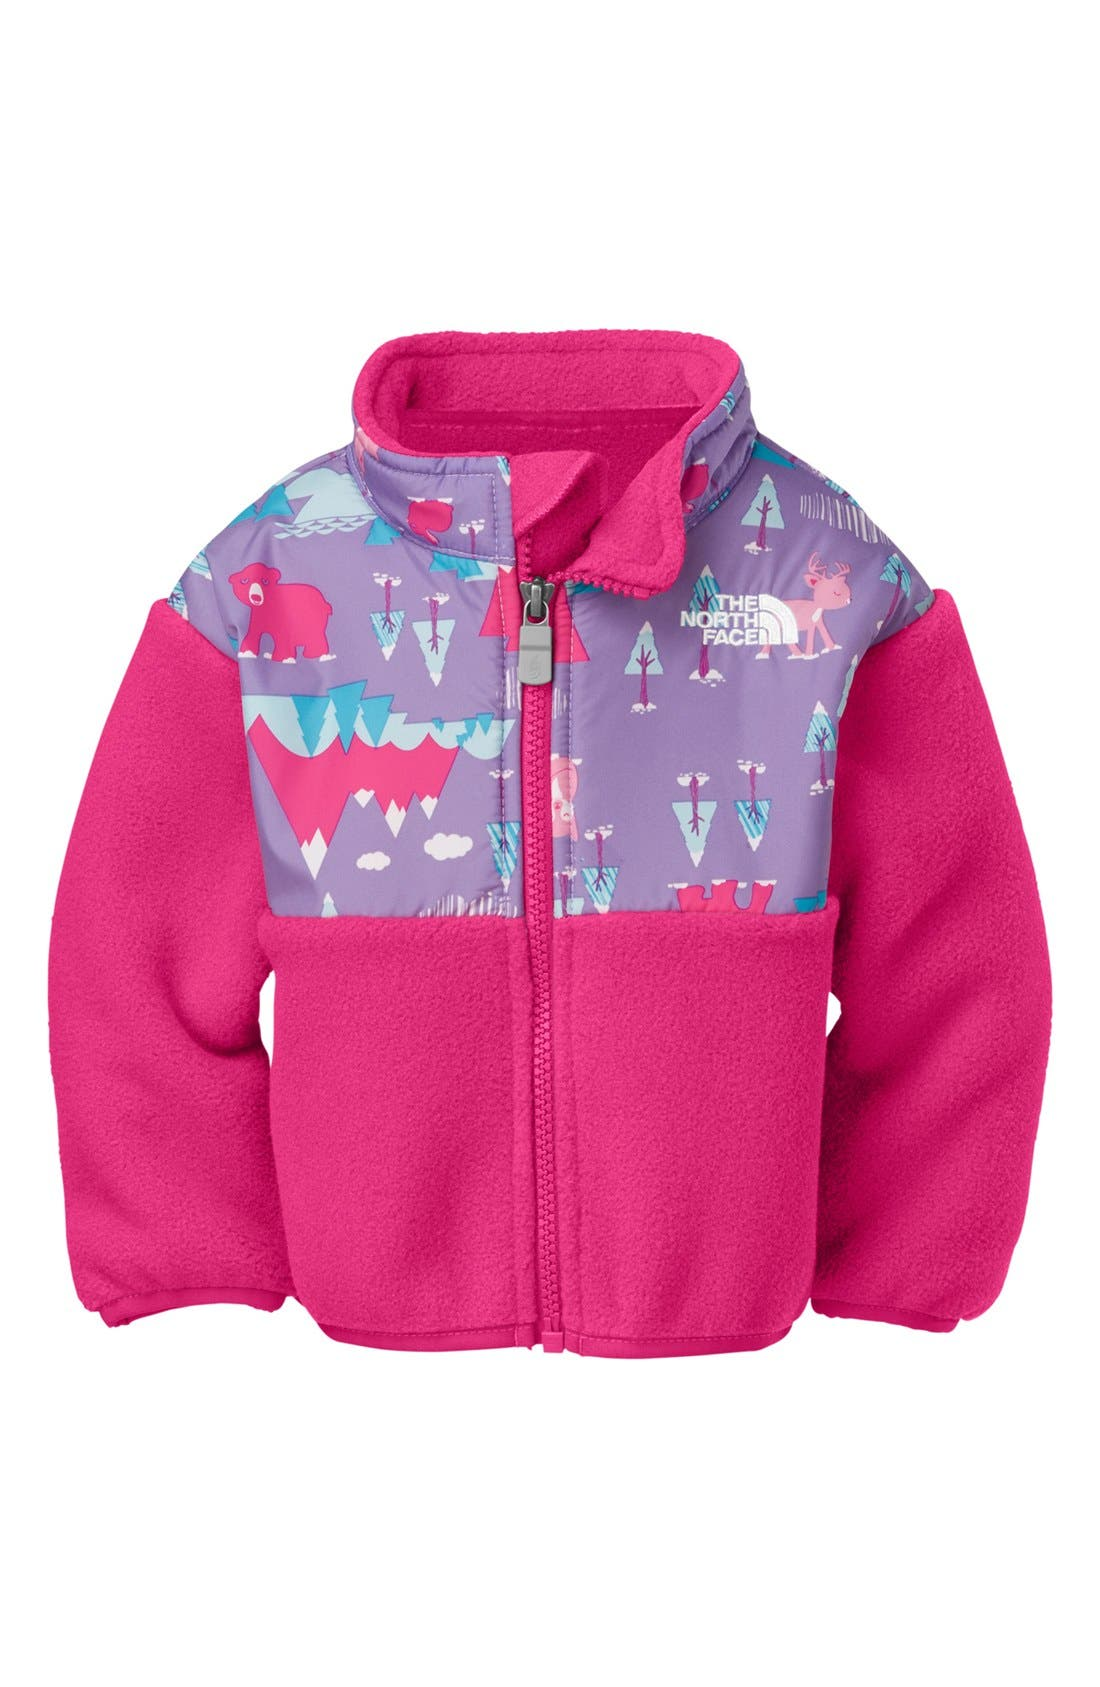 Alternate Image 1 Selected - The North Face 'Denali' Jacket (Baby Girls)